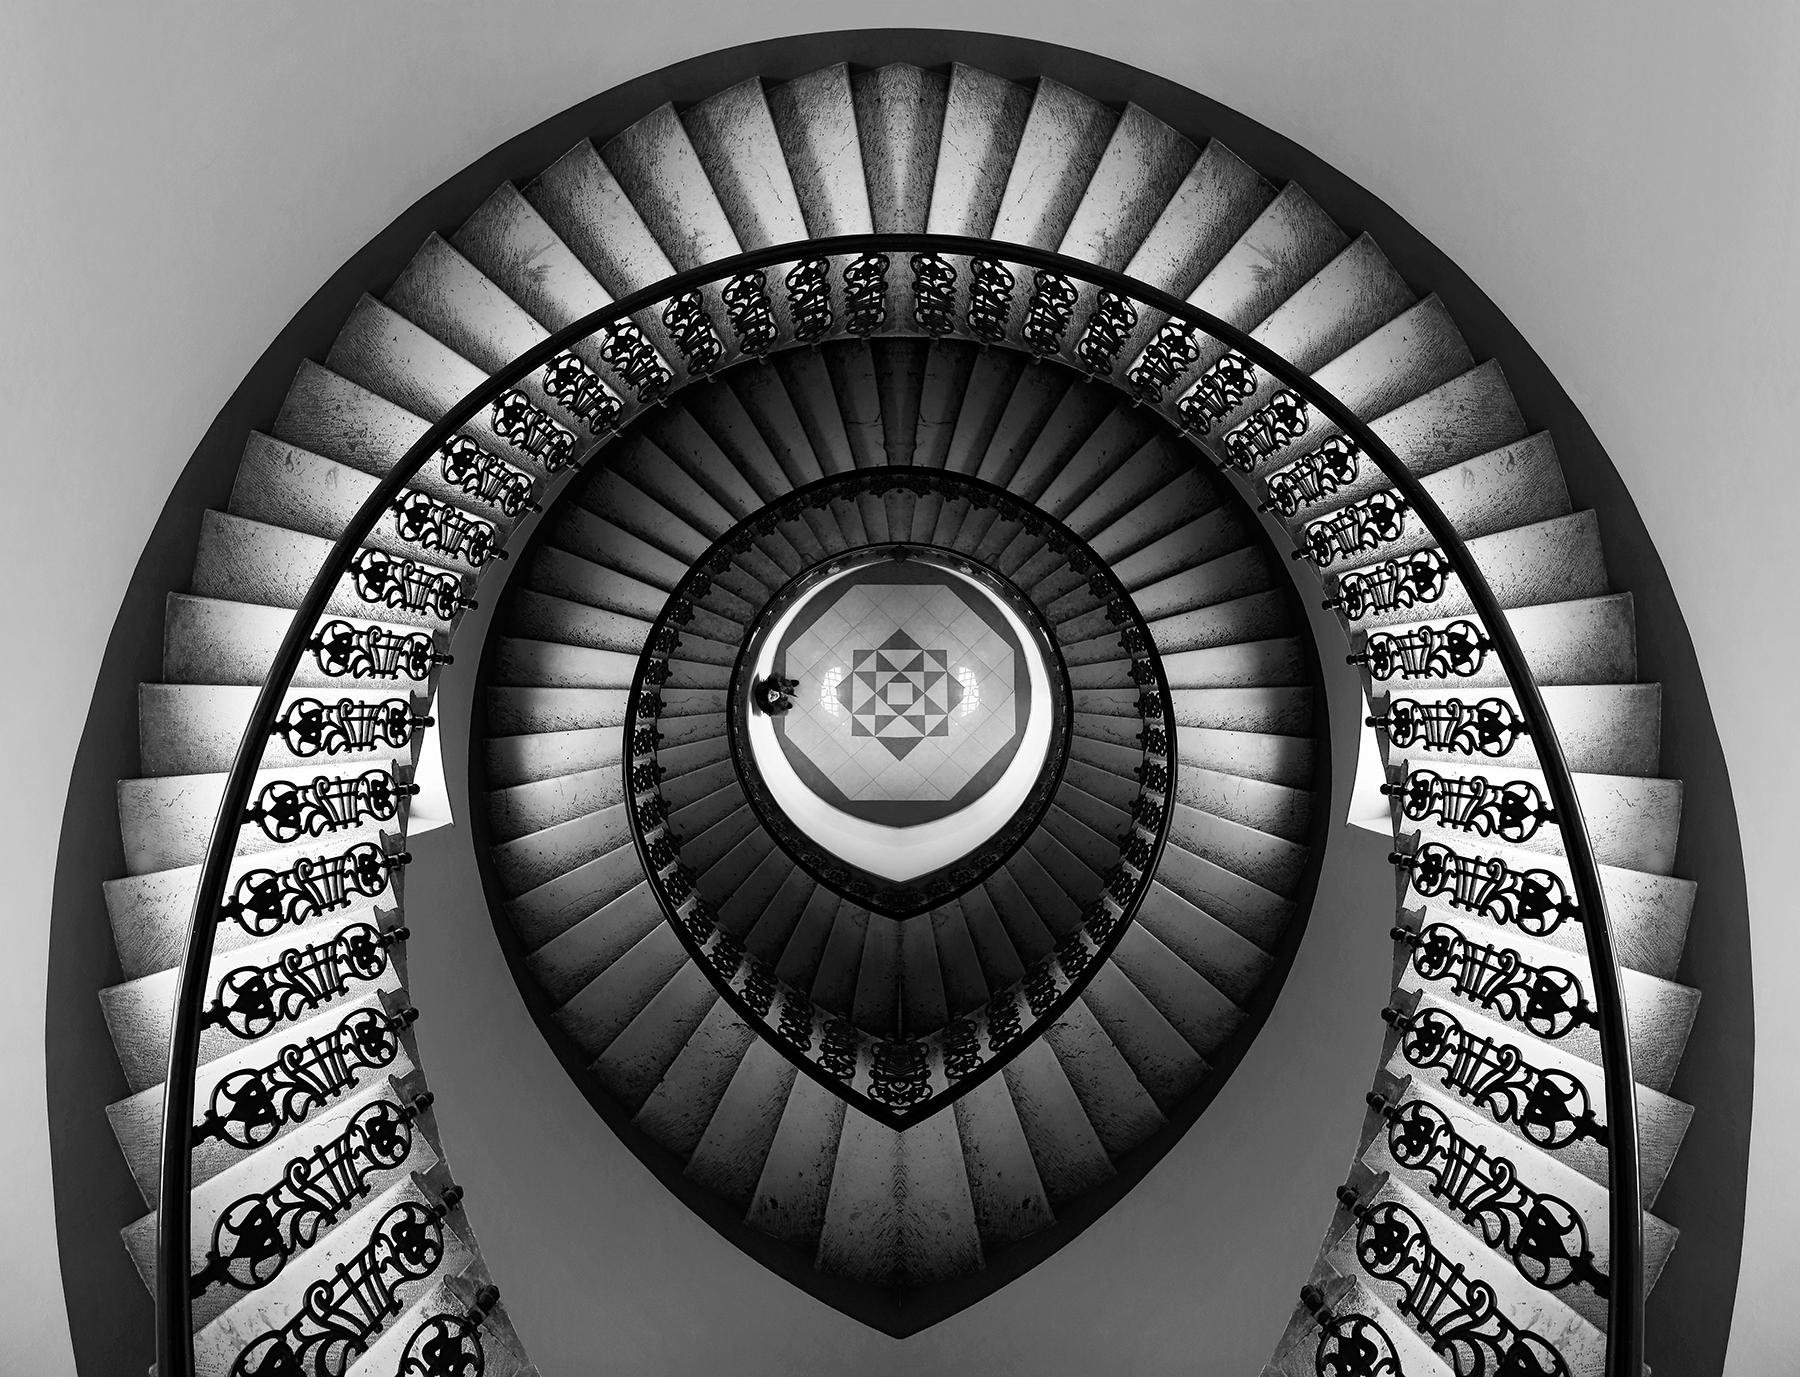 Maja_Strgar Kurecic_Dreaming Escher.jpg